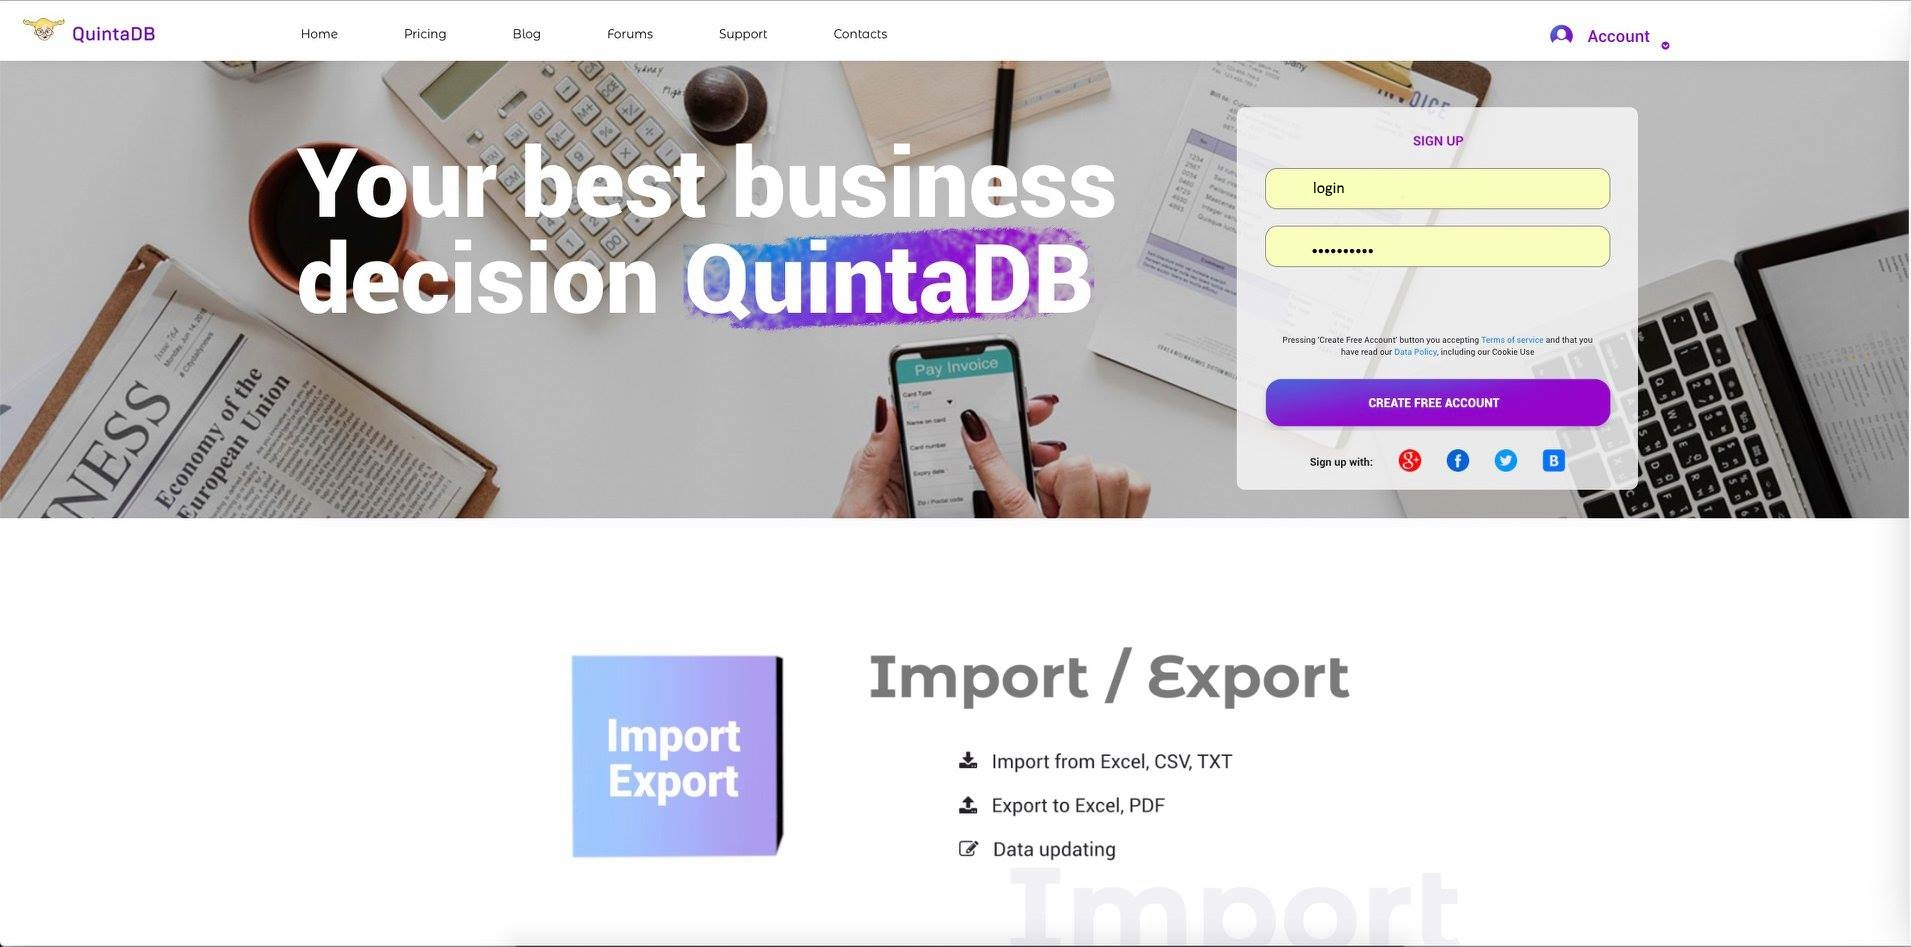 QuintaDB login page